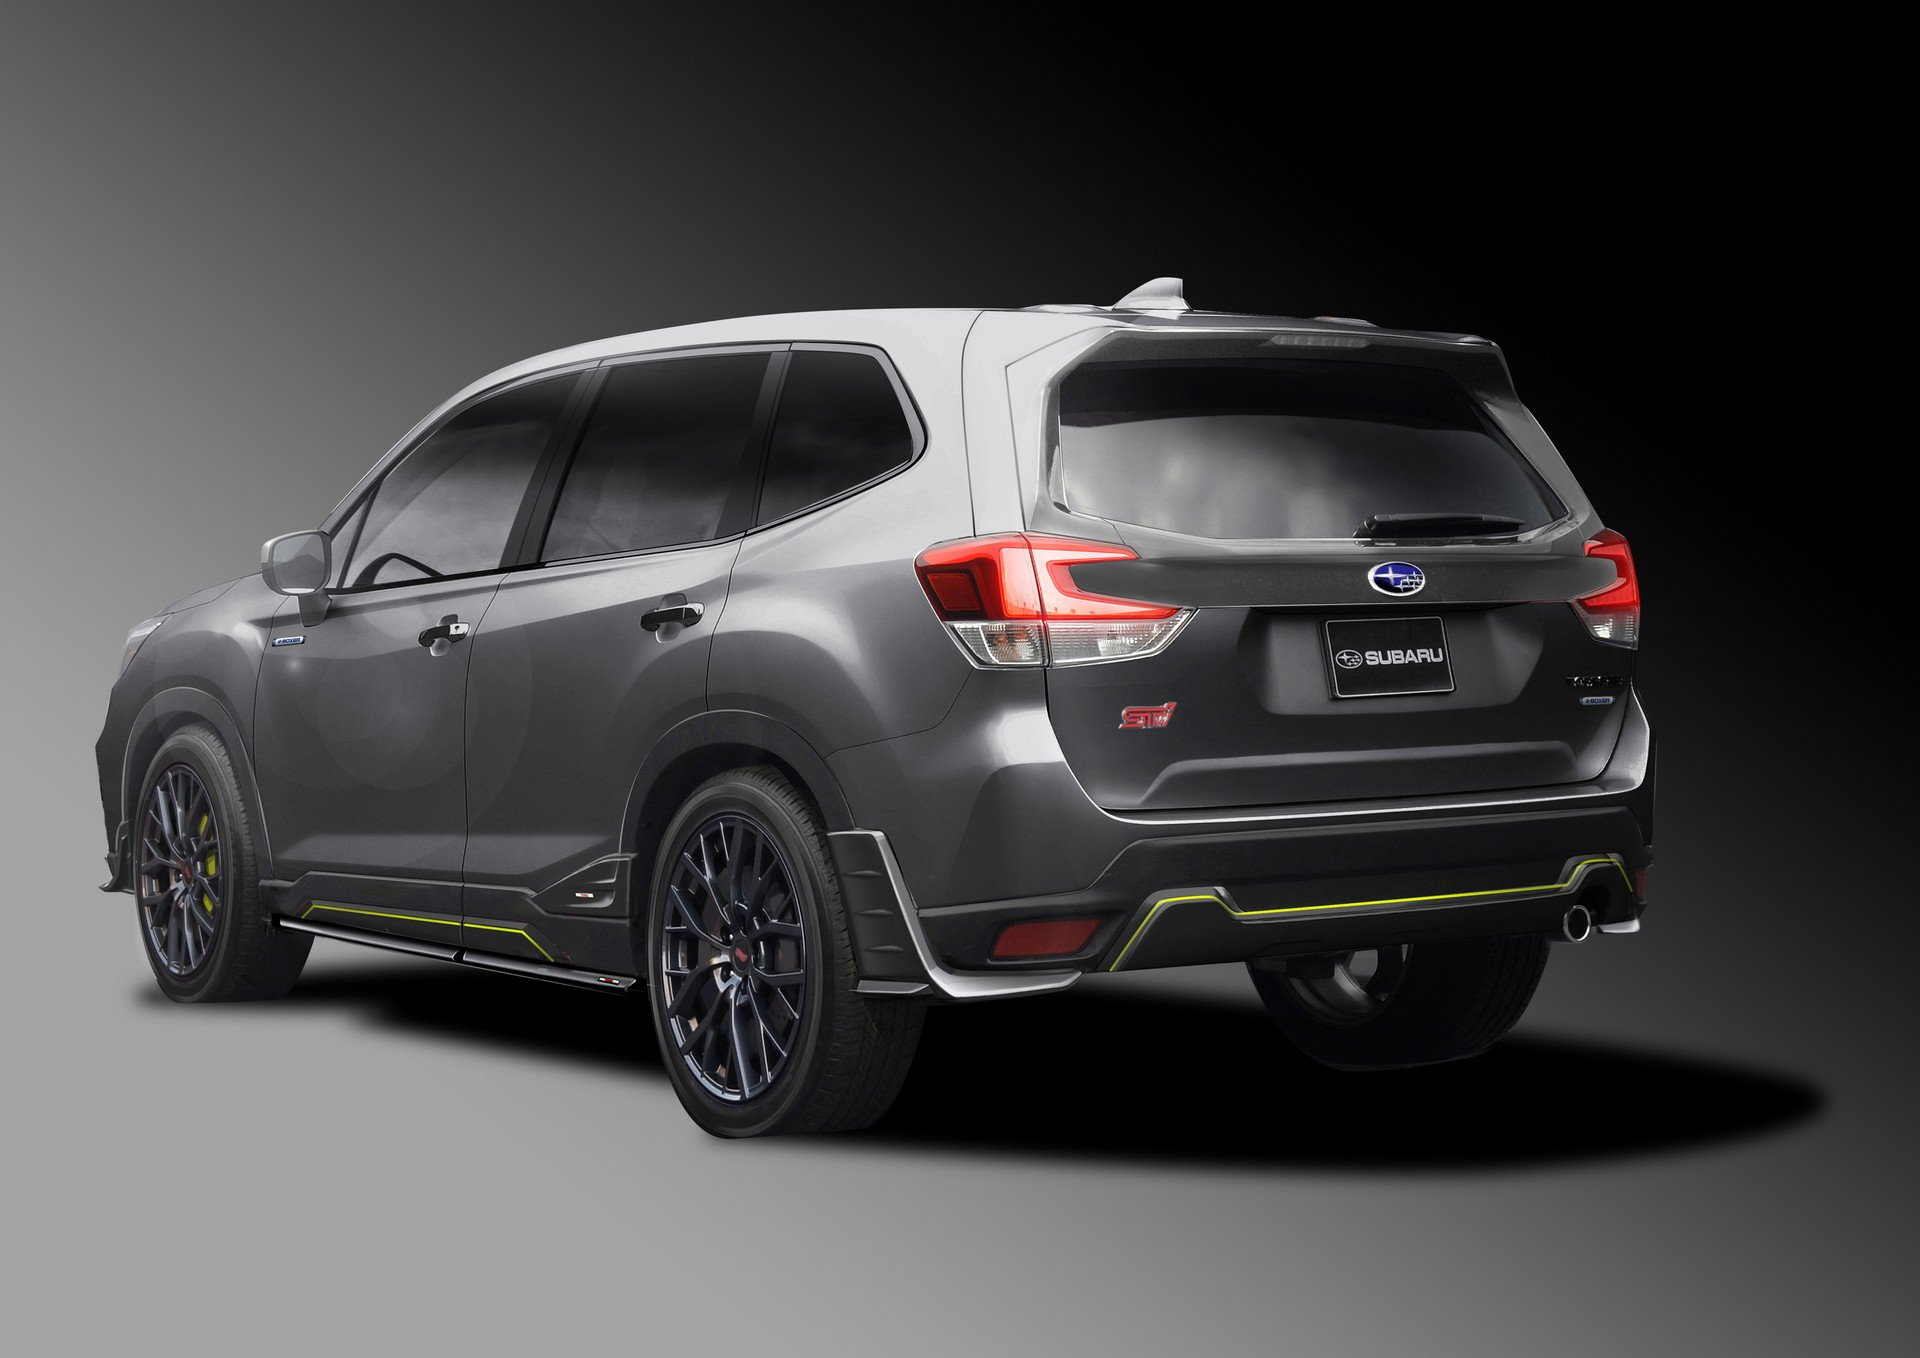 Subaru Sti Concepts Heading To Tokyo Auto Salon 2019